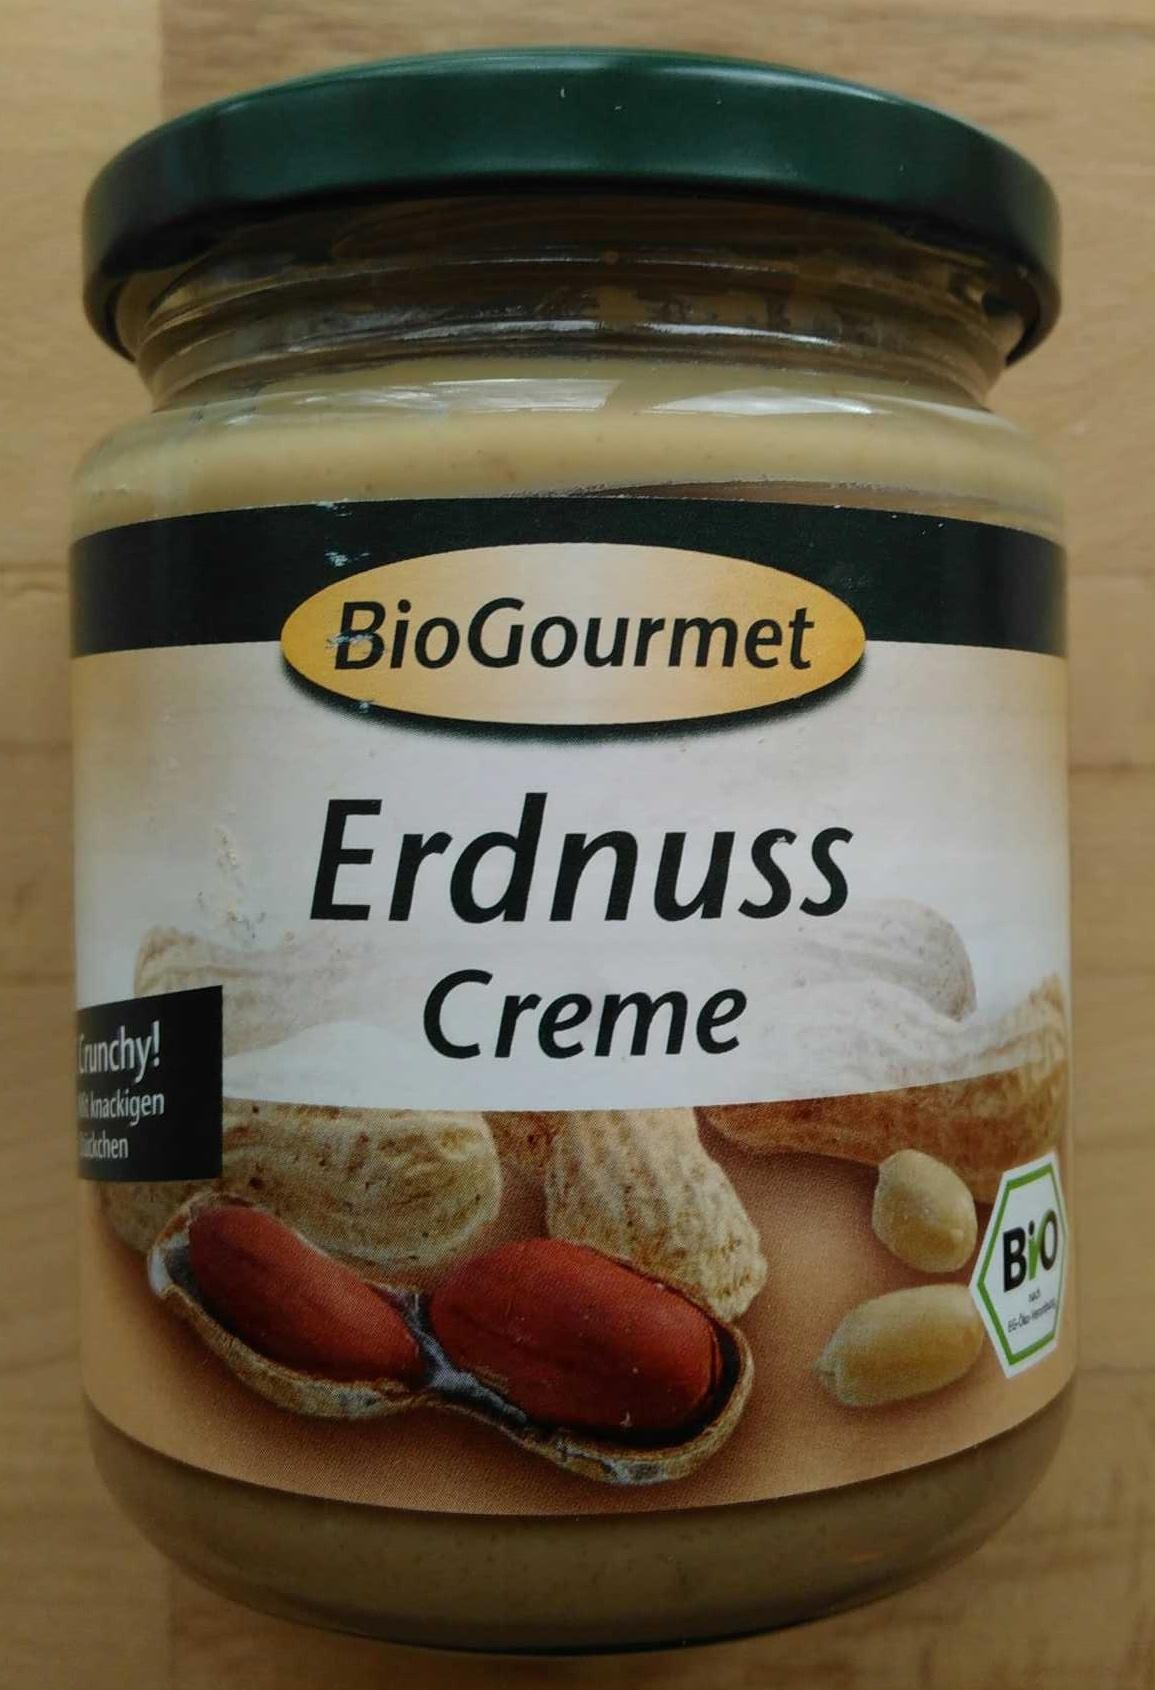 Erdnuss Creme - Product